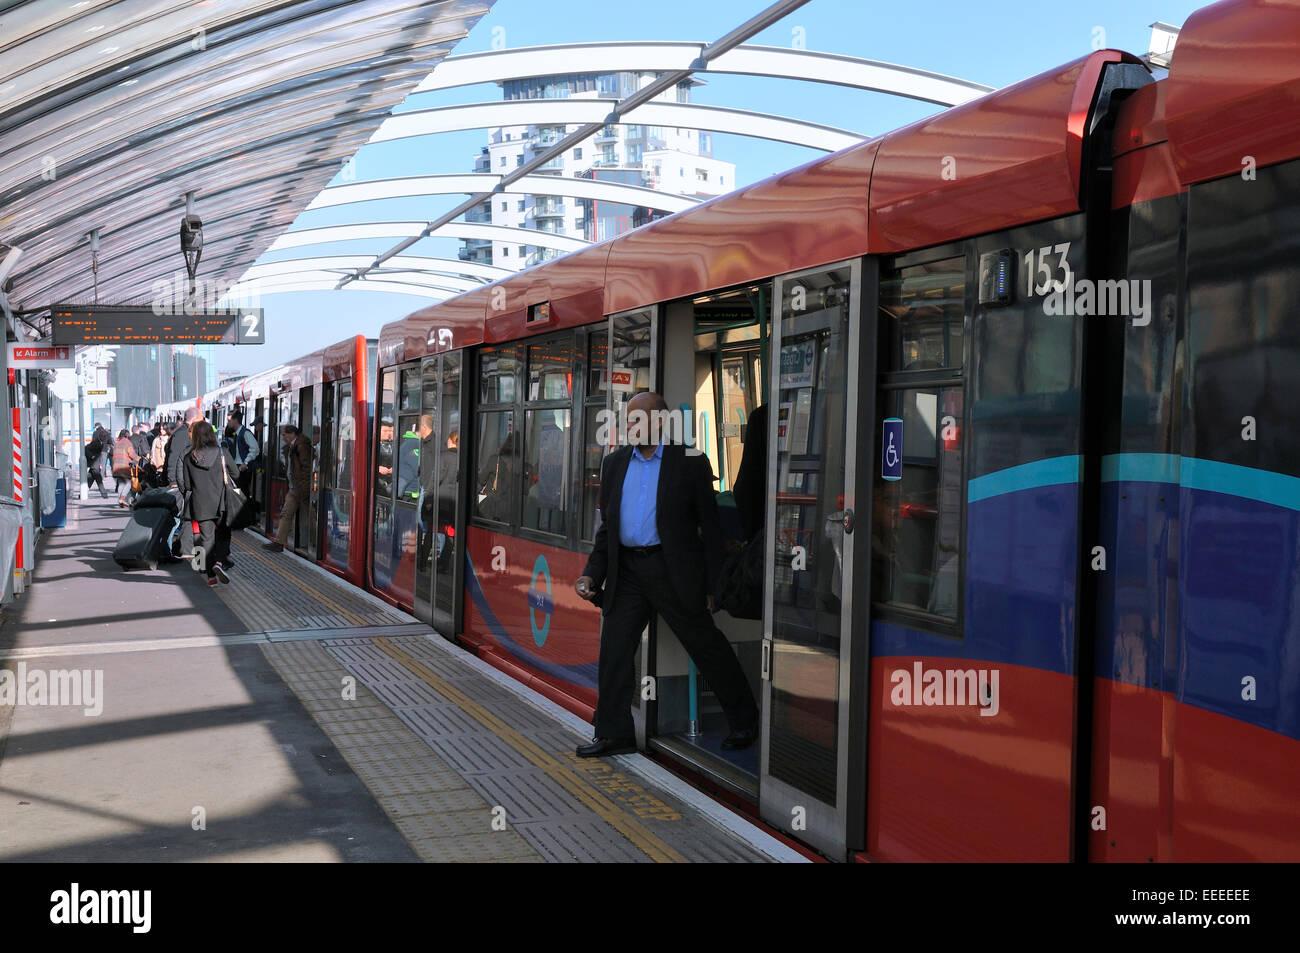 London Crossharbour station with Docklands Light Railway (DLR) train at platform - Stock Image